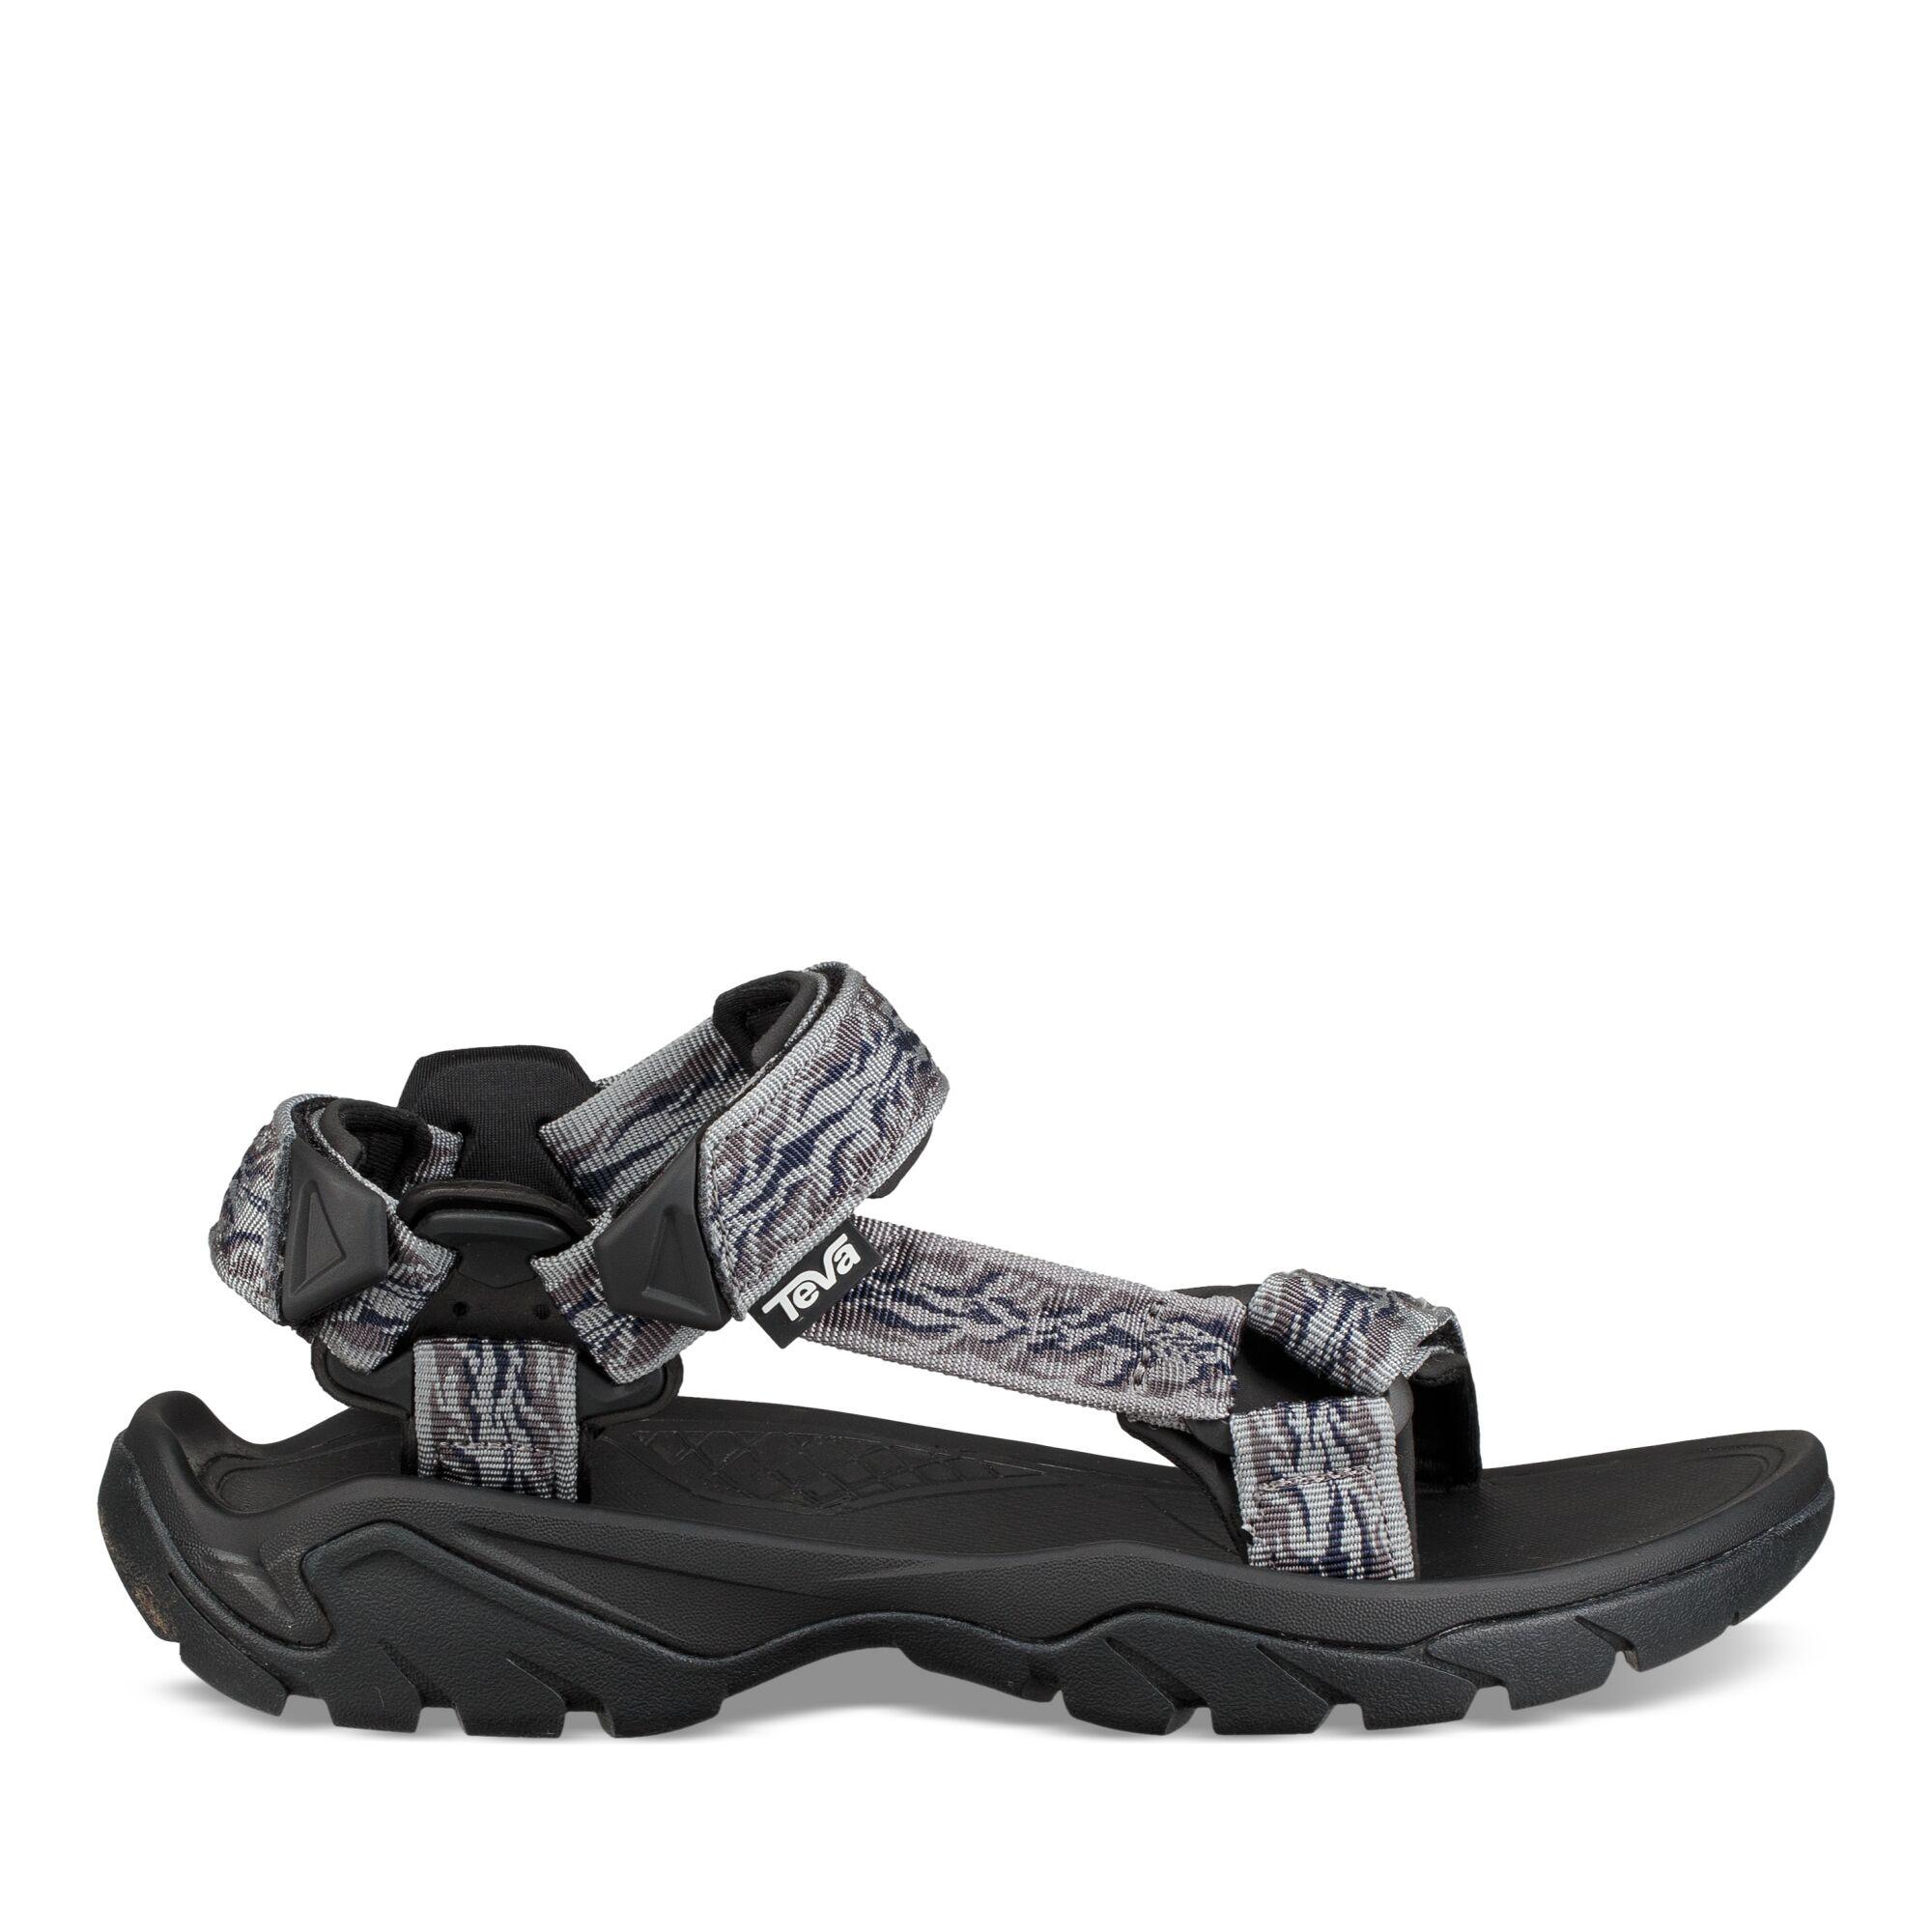 Teva M Terra Fi 5 Universal - Sandal til mænd - Manzanita Wild Dove | Running shoes